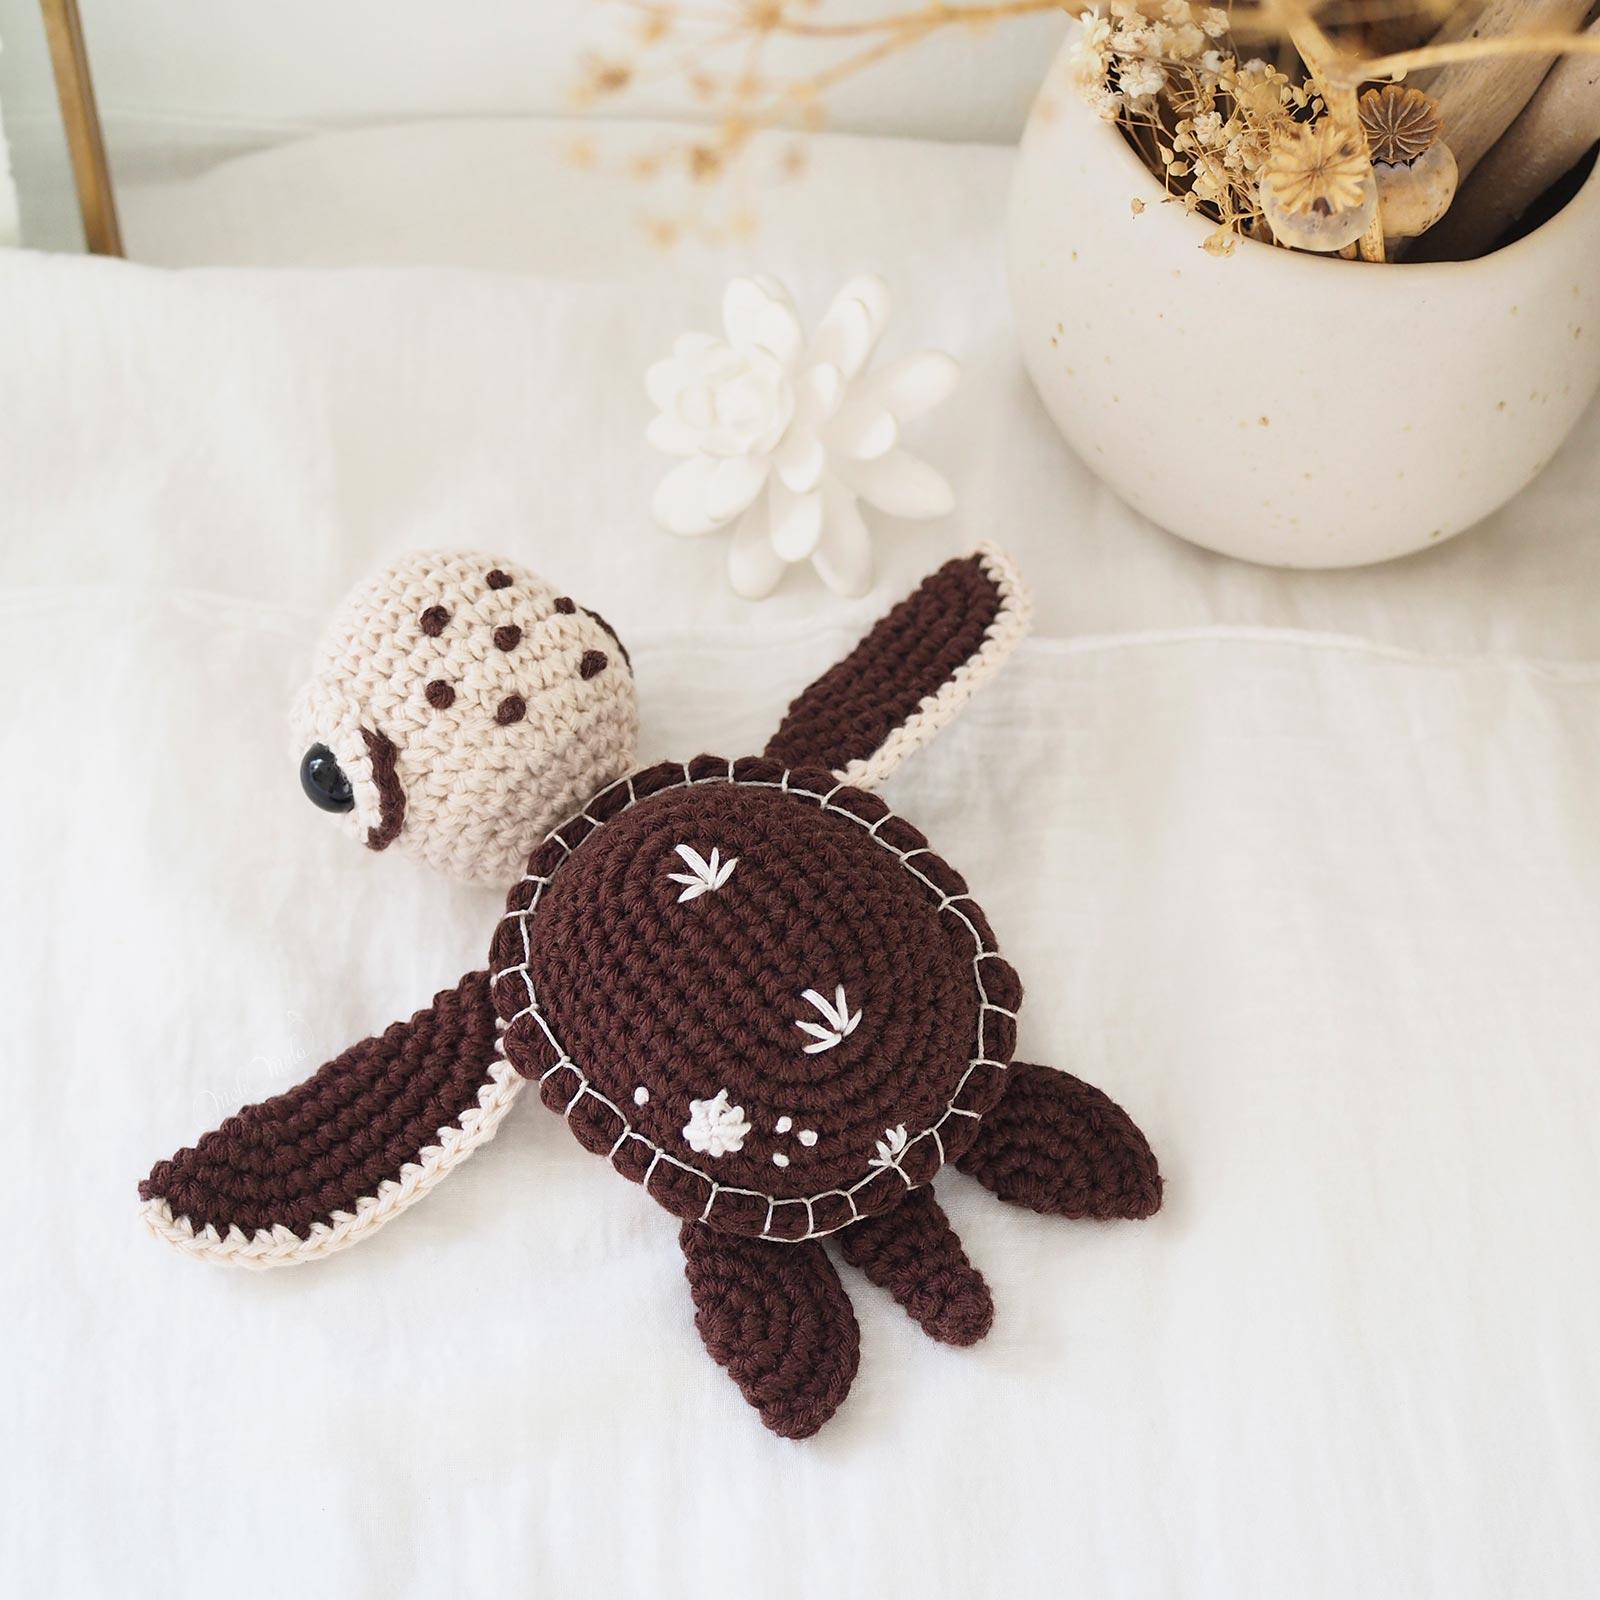 crochet-amigurumi-green-sea-turtle-amigurumiwildlife-tortue-mer-ricorumi-laboutiquedemelimelo